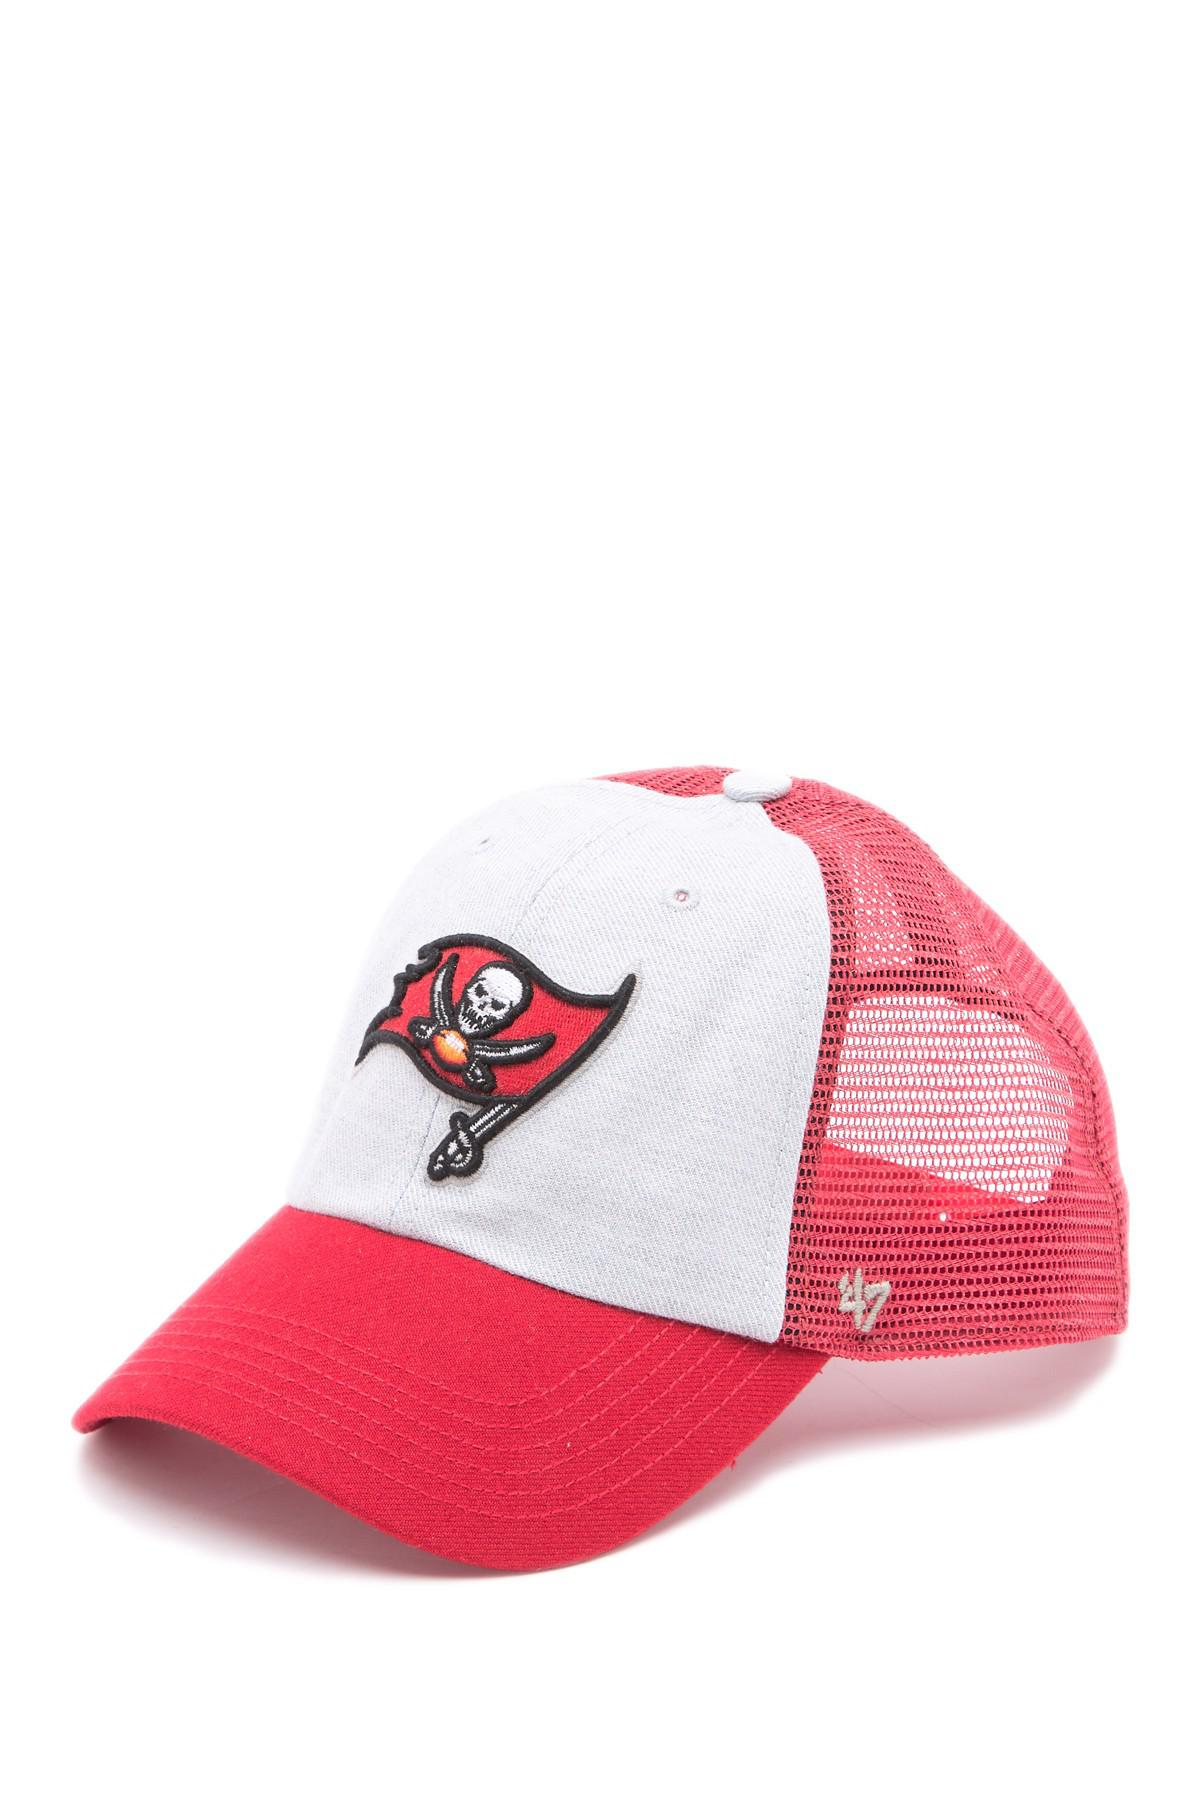 buy popular 7d644 a654d ... Red Nfl Belmont Buccaneers Baseball Cap for Men - Lyst. View fullscreen